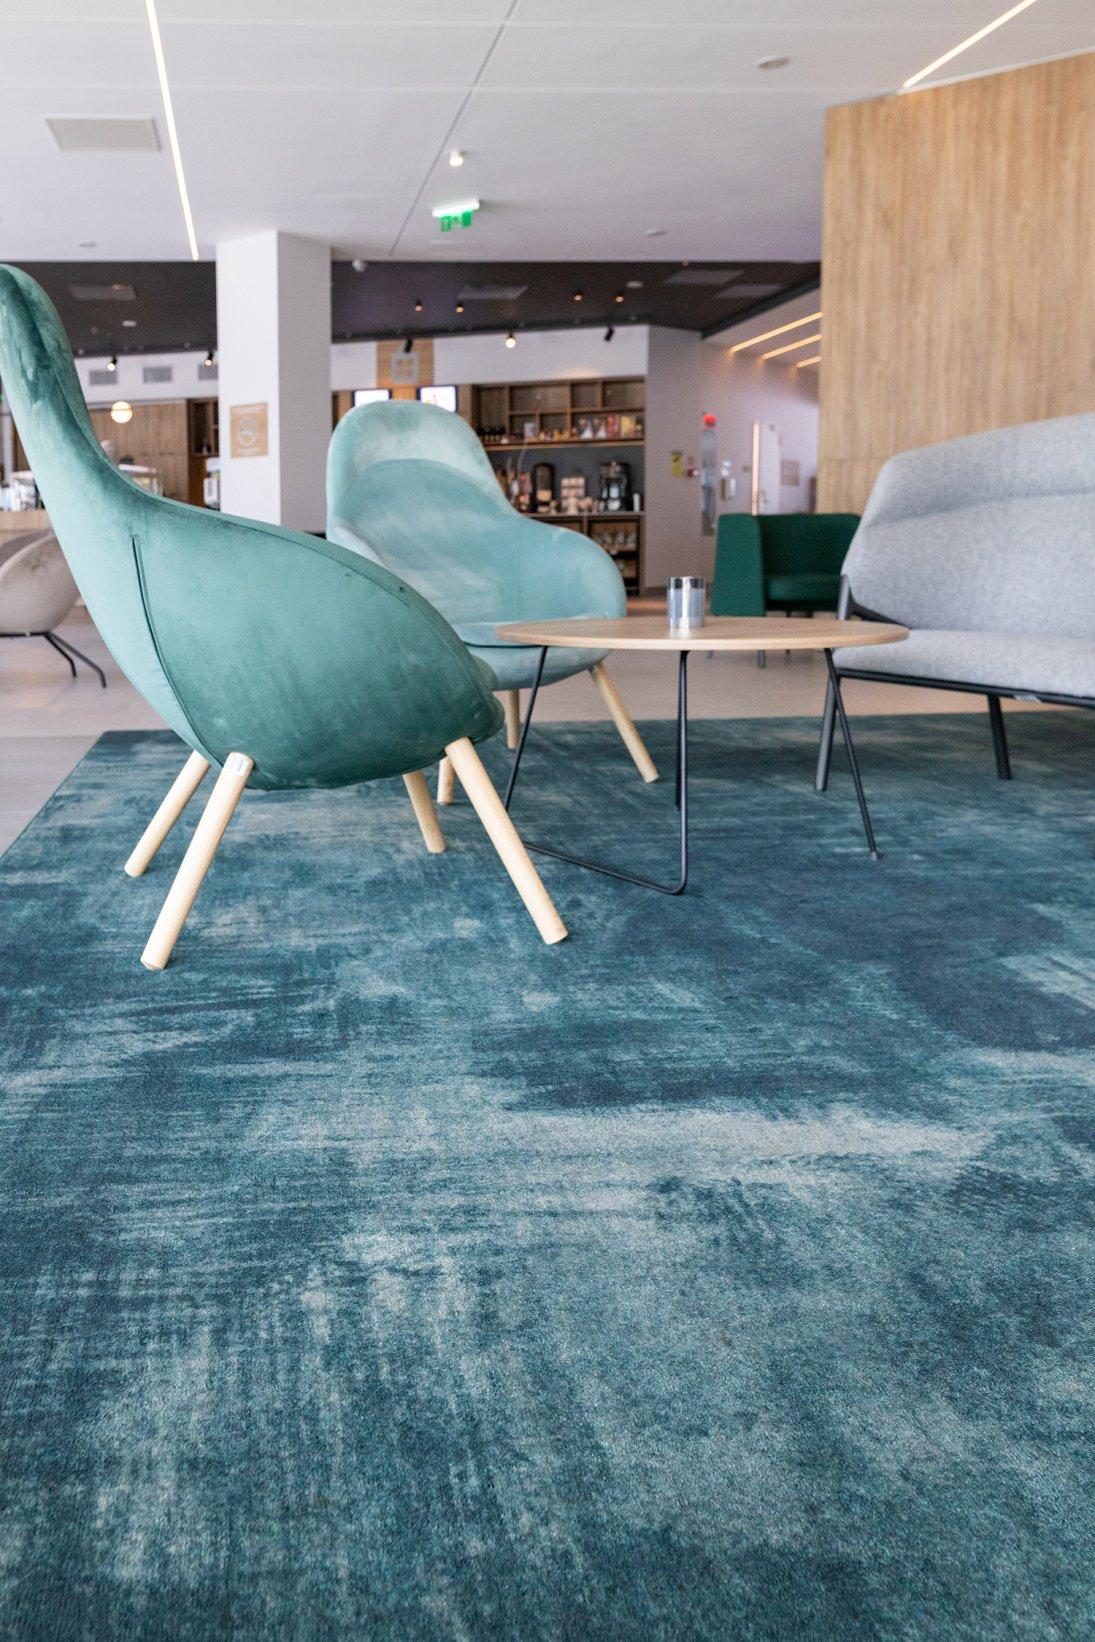 20200625-carpet-and-more-hilton-otopeni-31